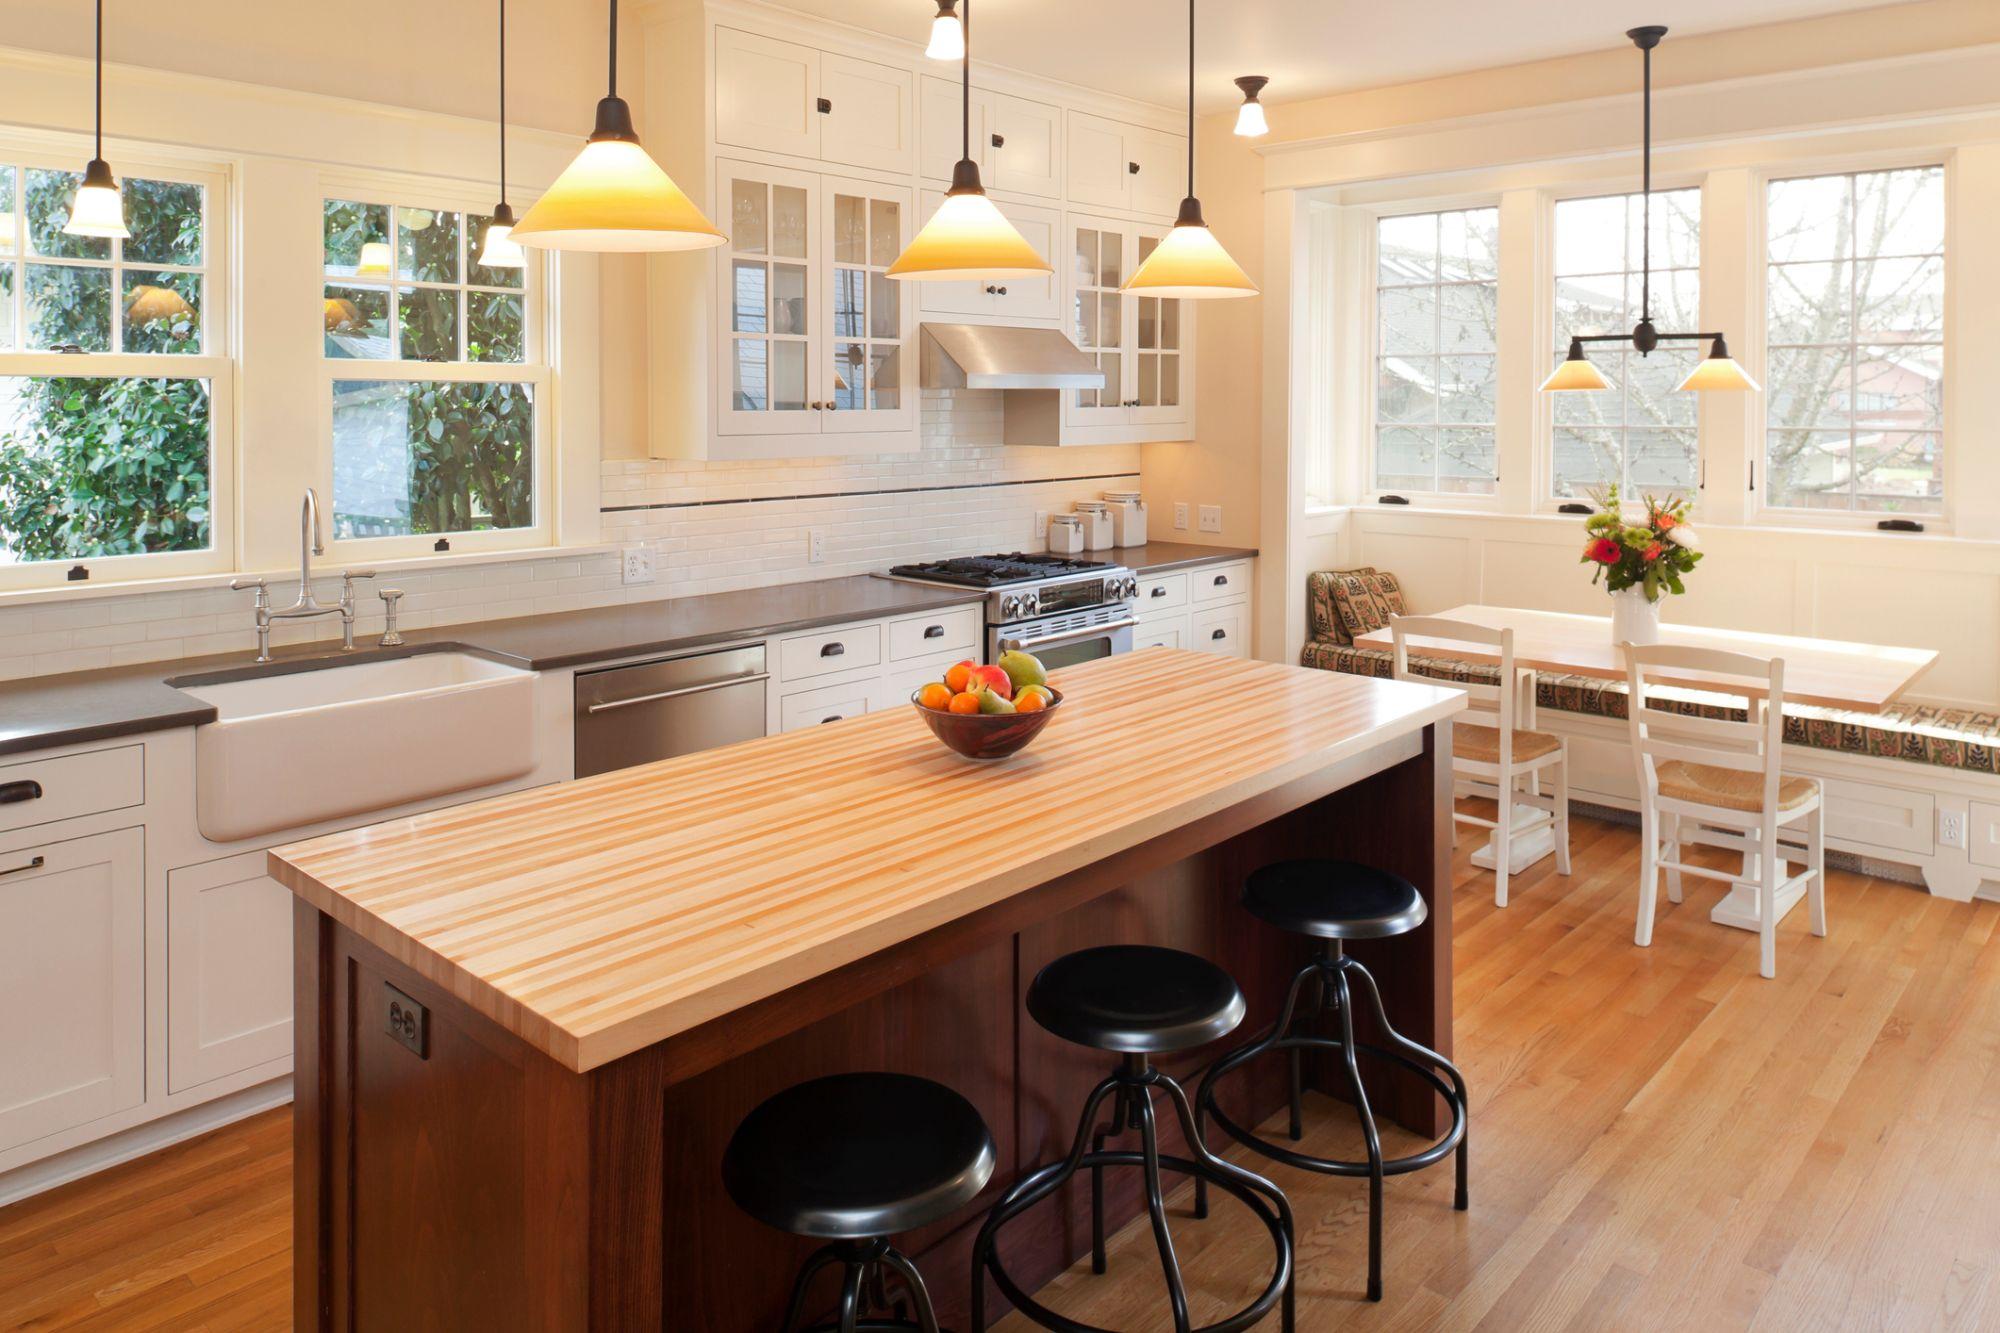 Modern kitchen with good lighting